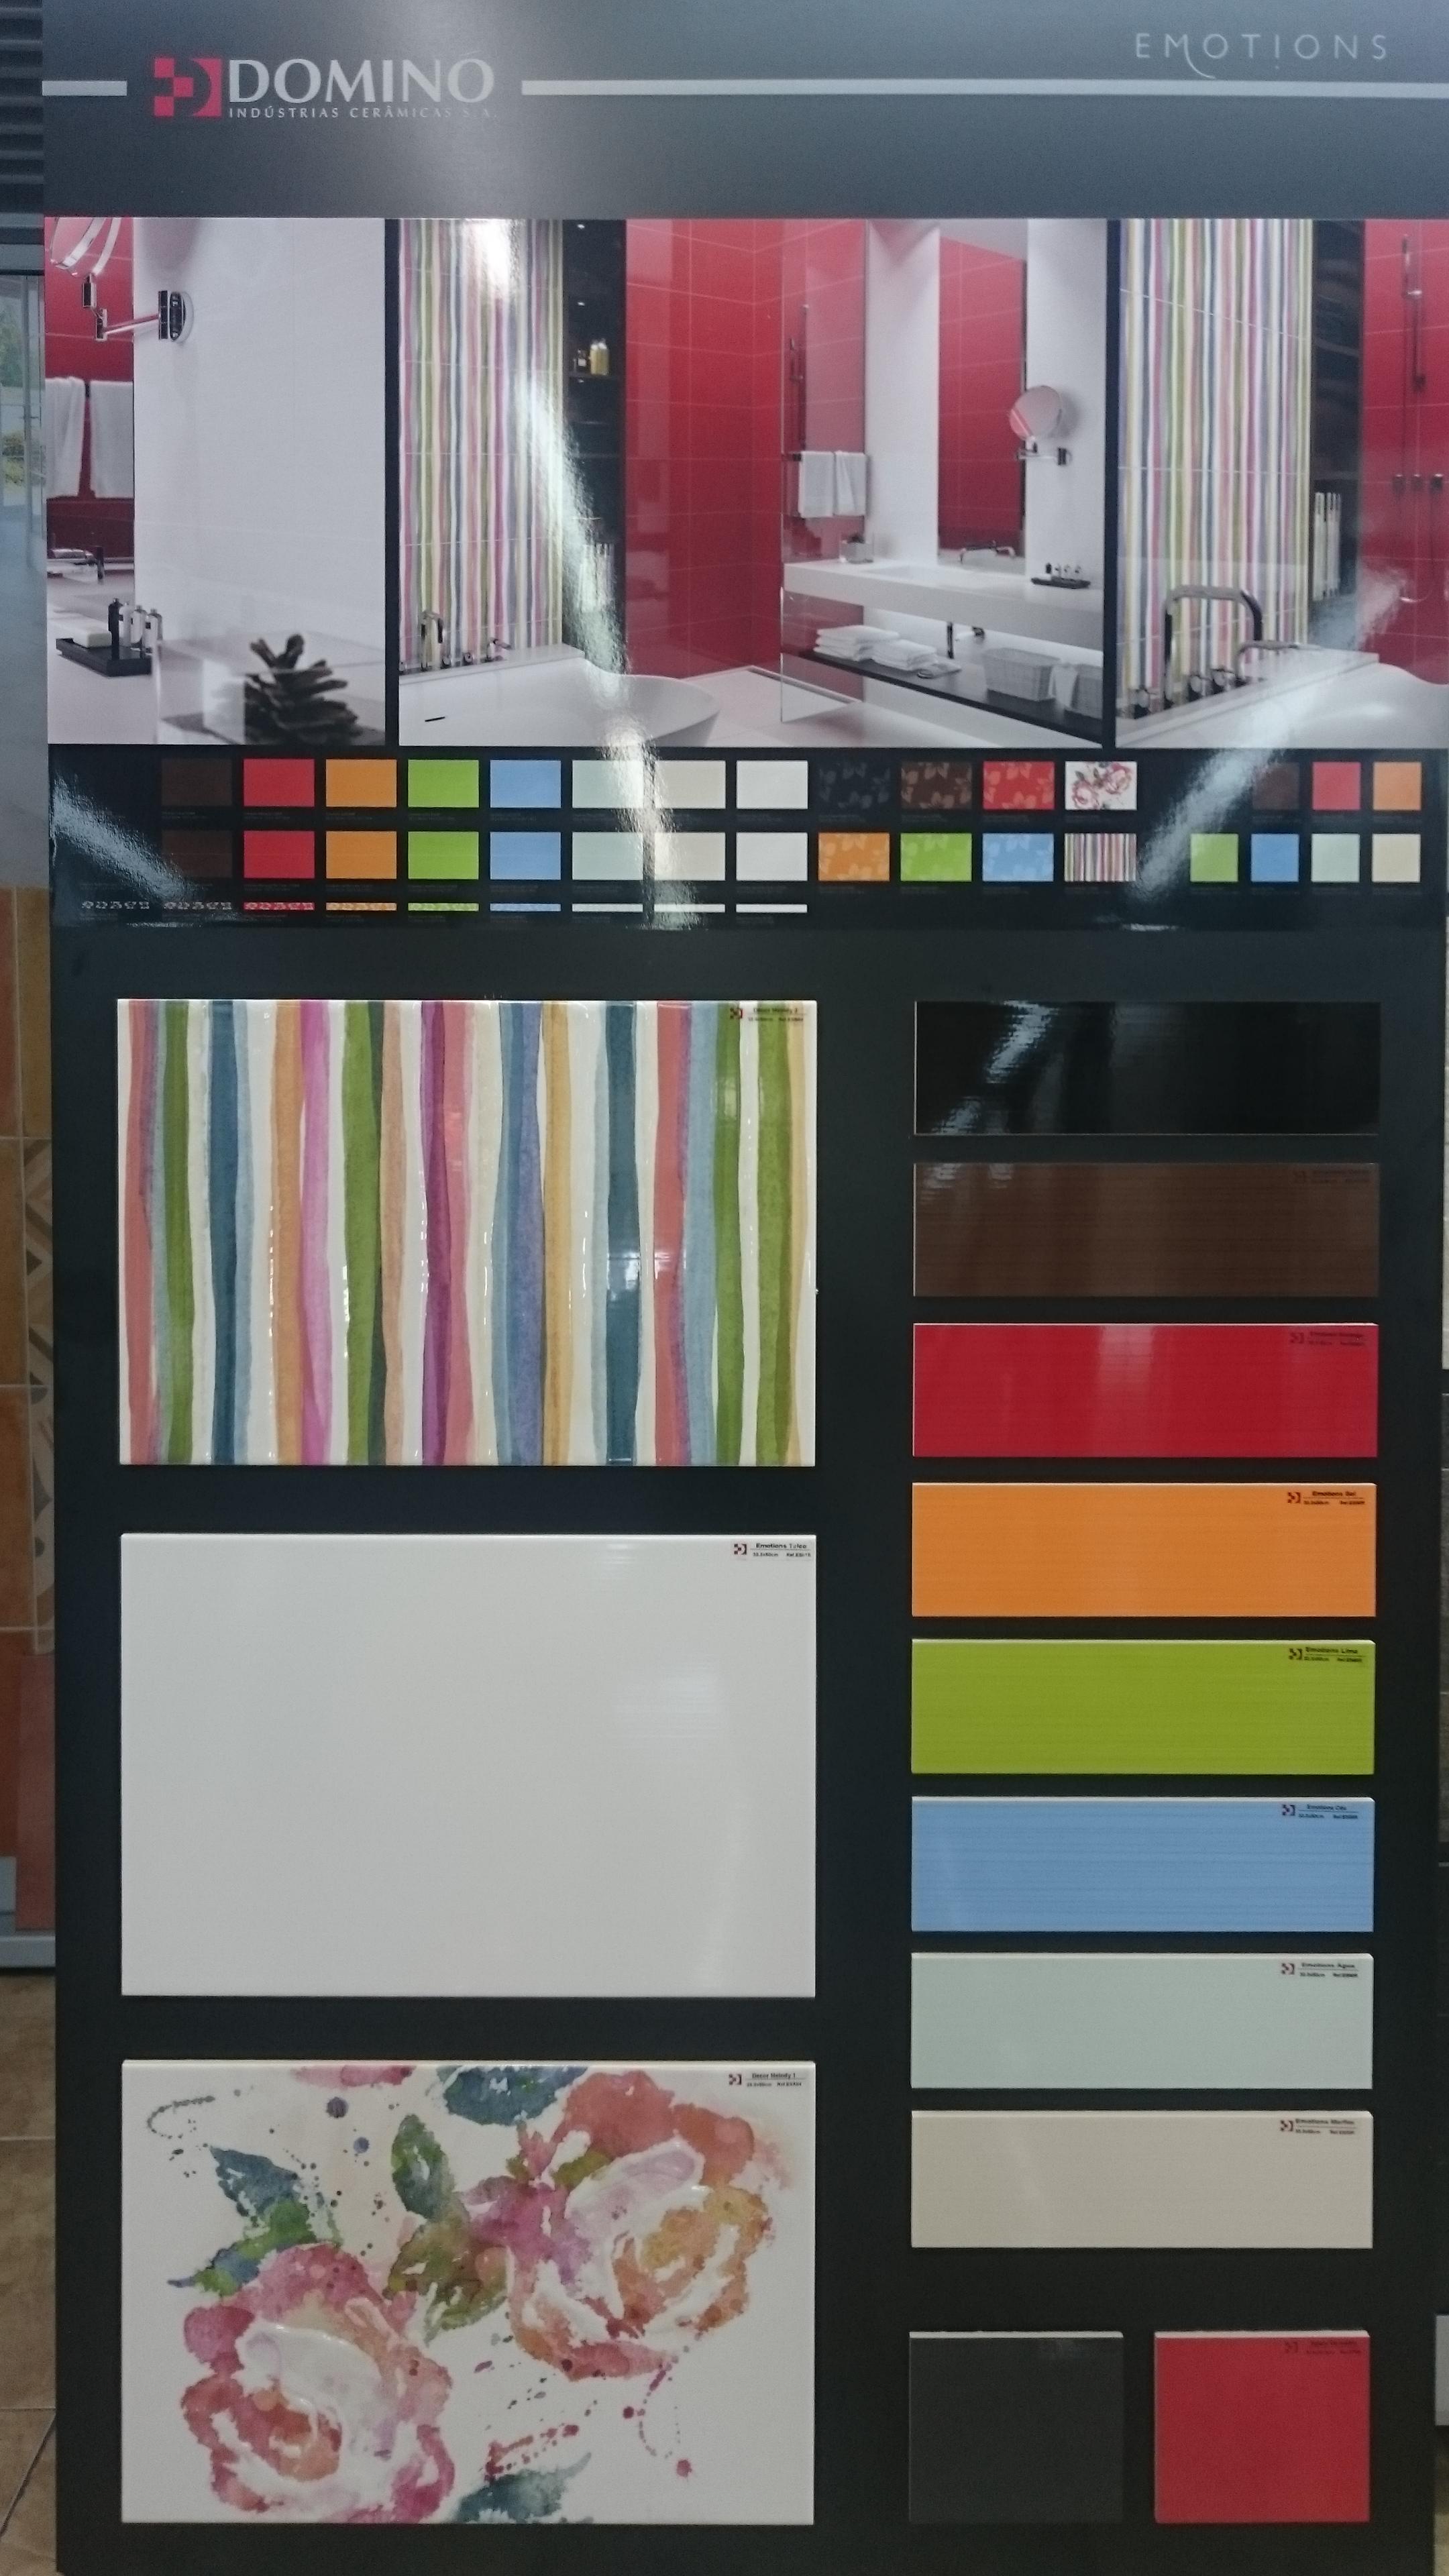 33 50 emotions azulejos y pavimentos mart n for Azulejos y pavimentos san juan